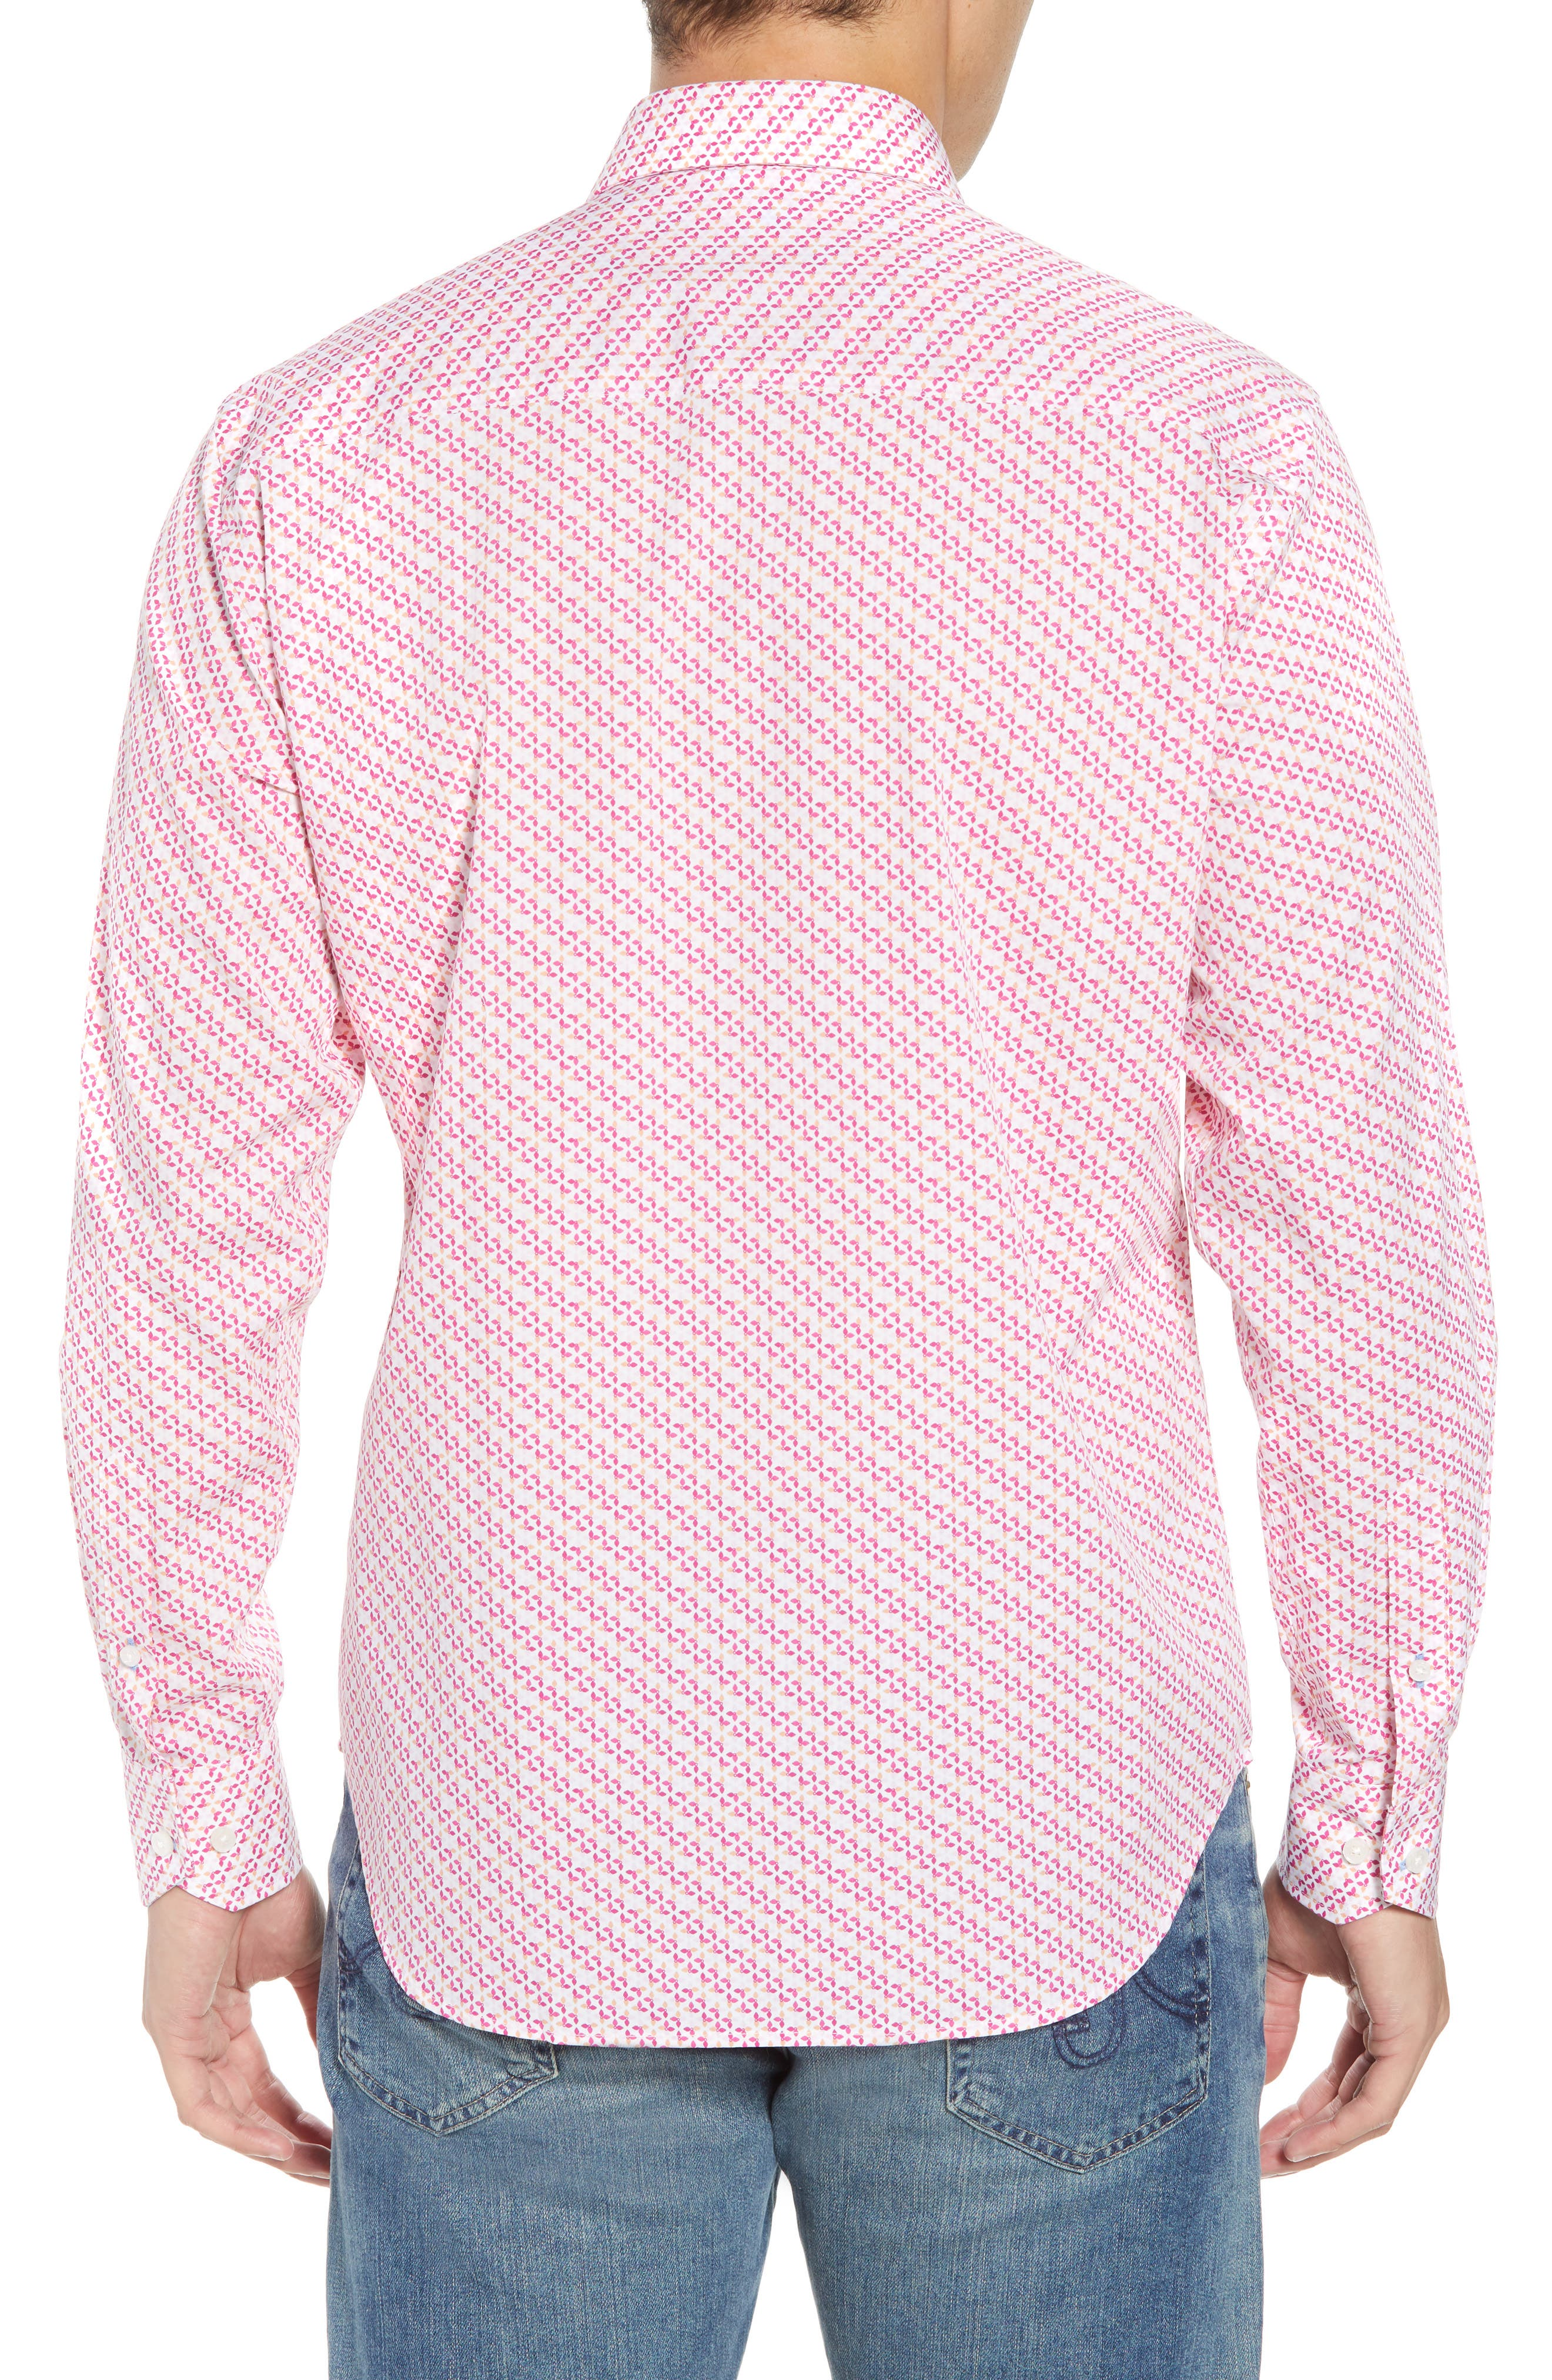 Ade Regular Fit Print Sport Shirt,                             Alternate thumbnail 2, color,                             650